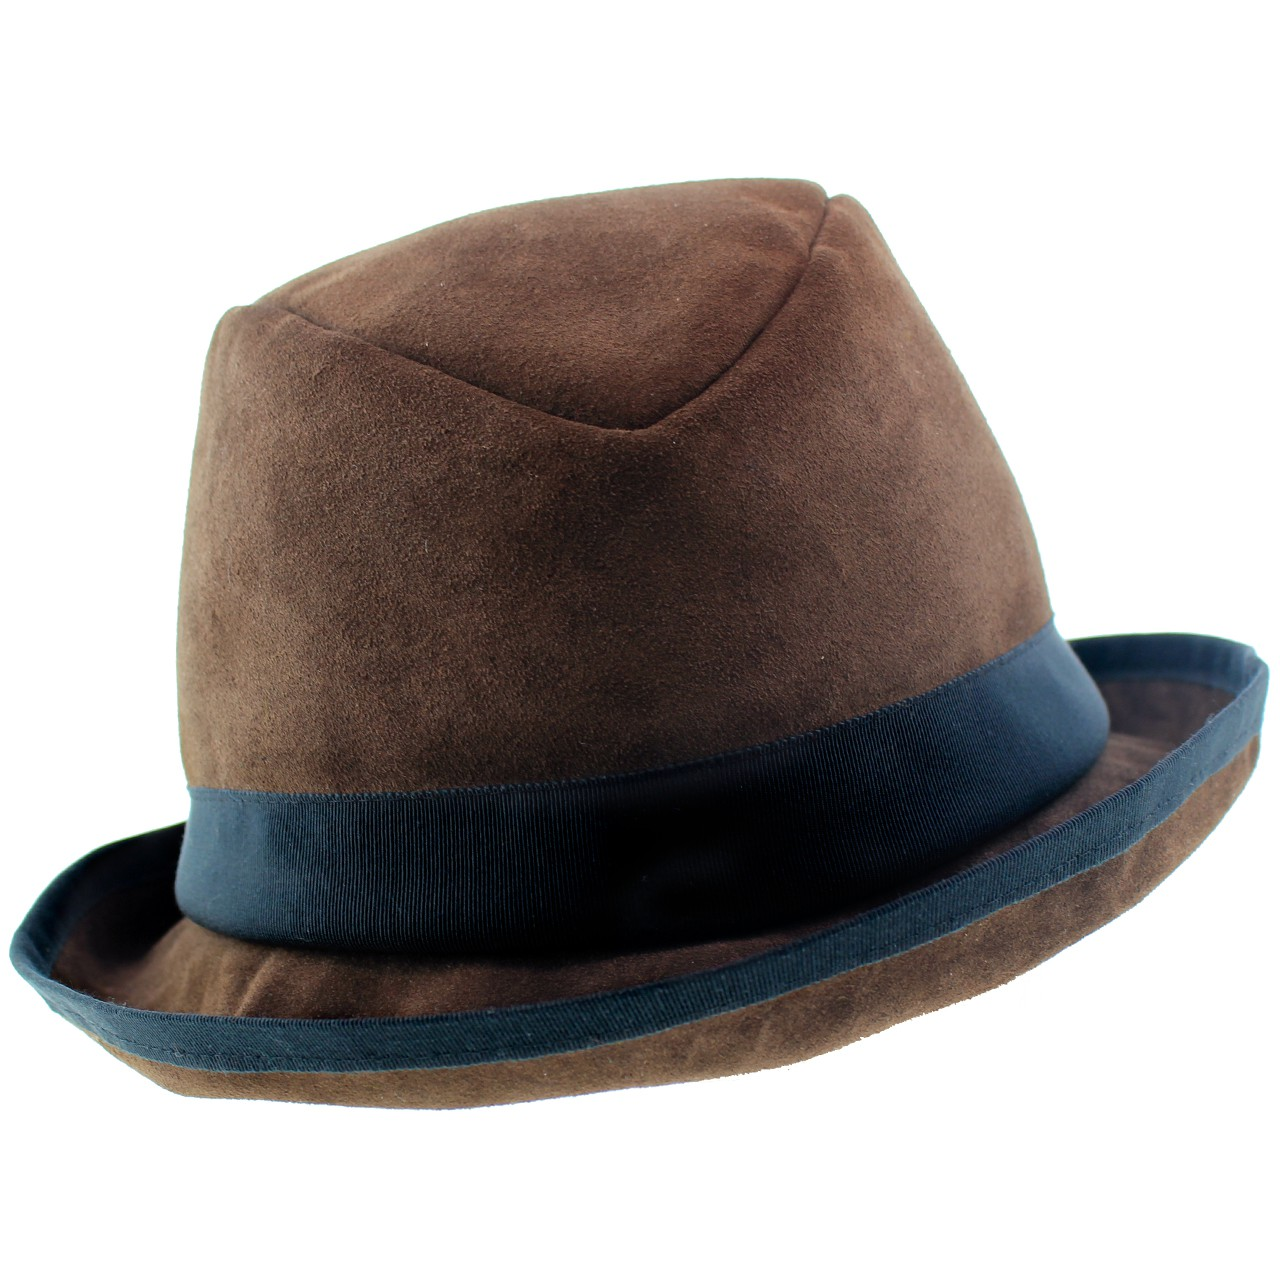 Fall and Winter Men s Hat Collection - JenniferOuellette d8c9b838f71f